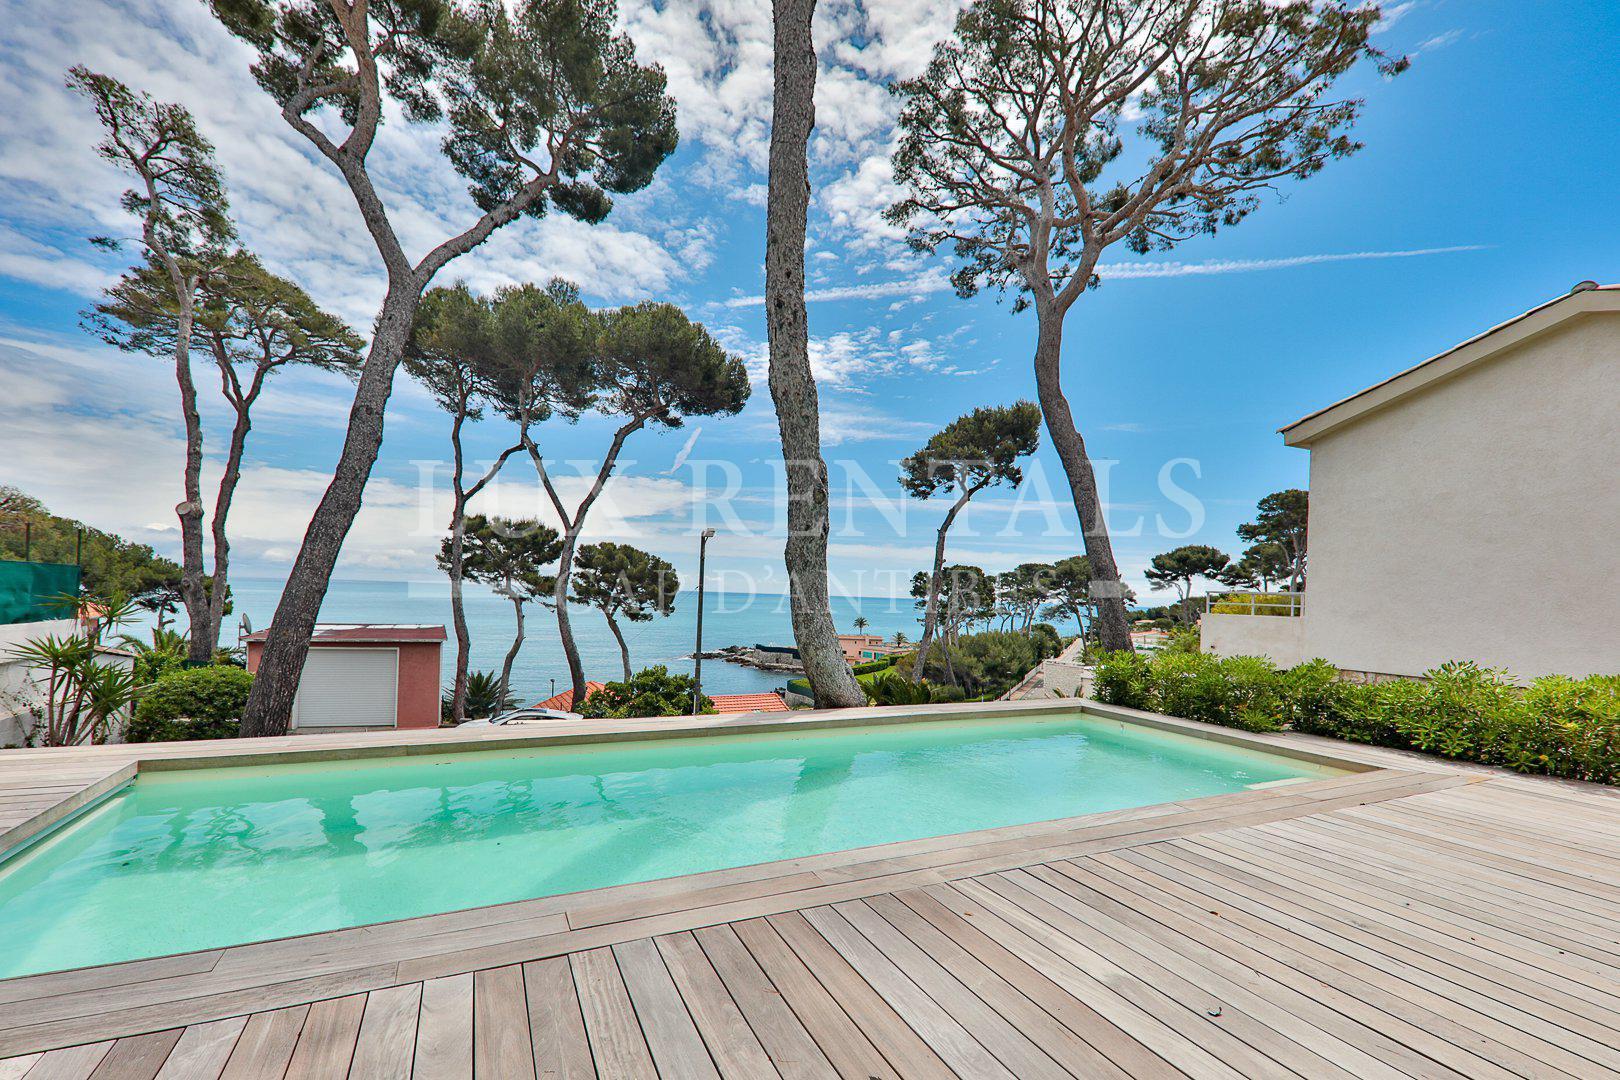 Location saisonnière Villa - Antibes Cap-d'Antibes